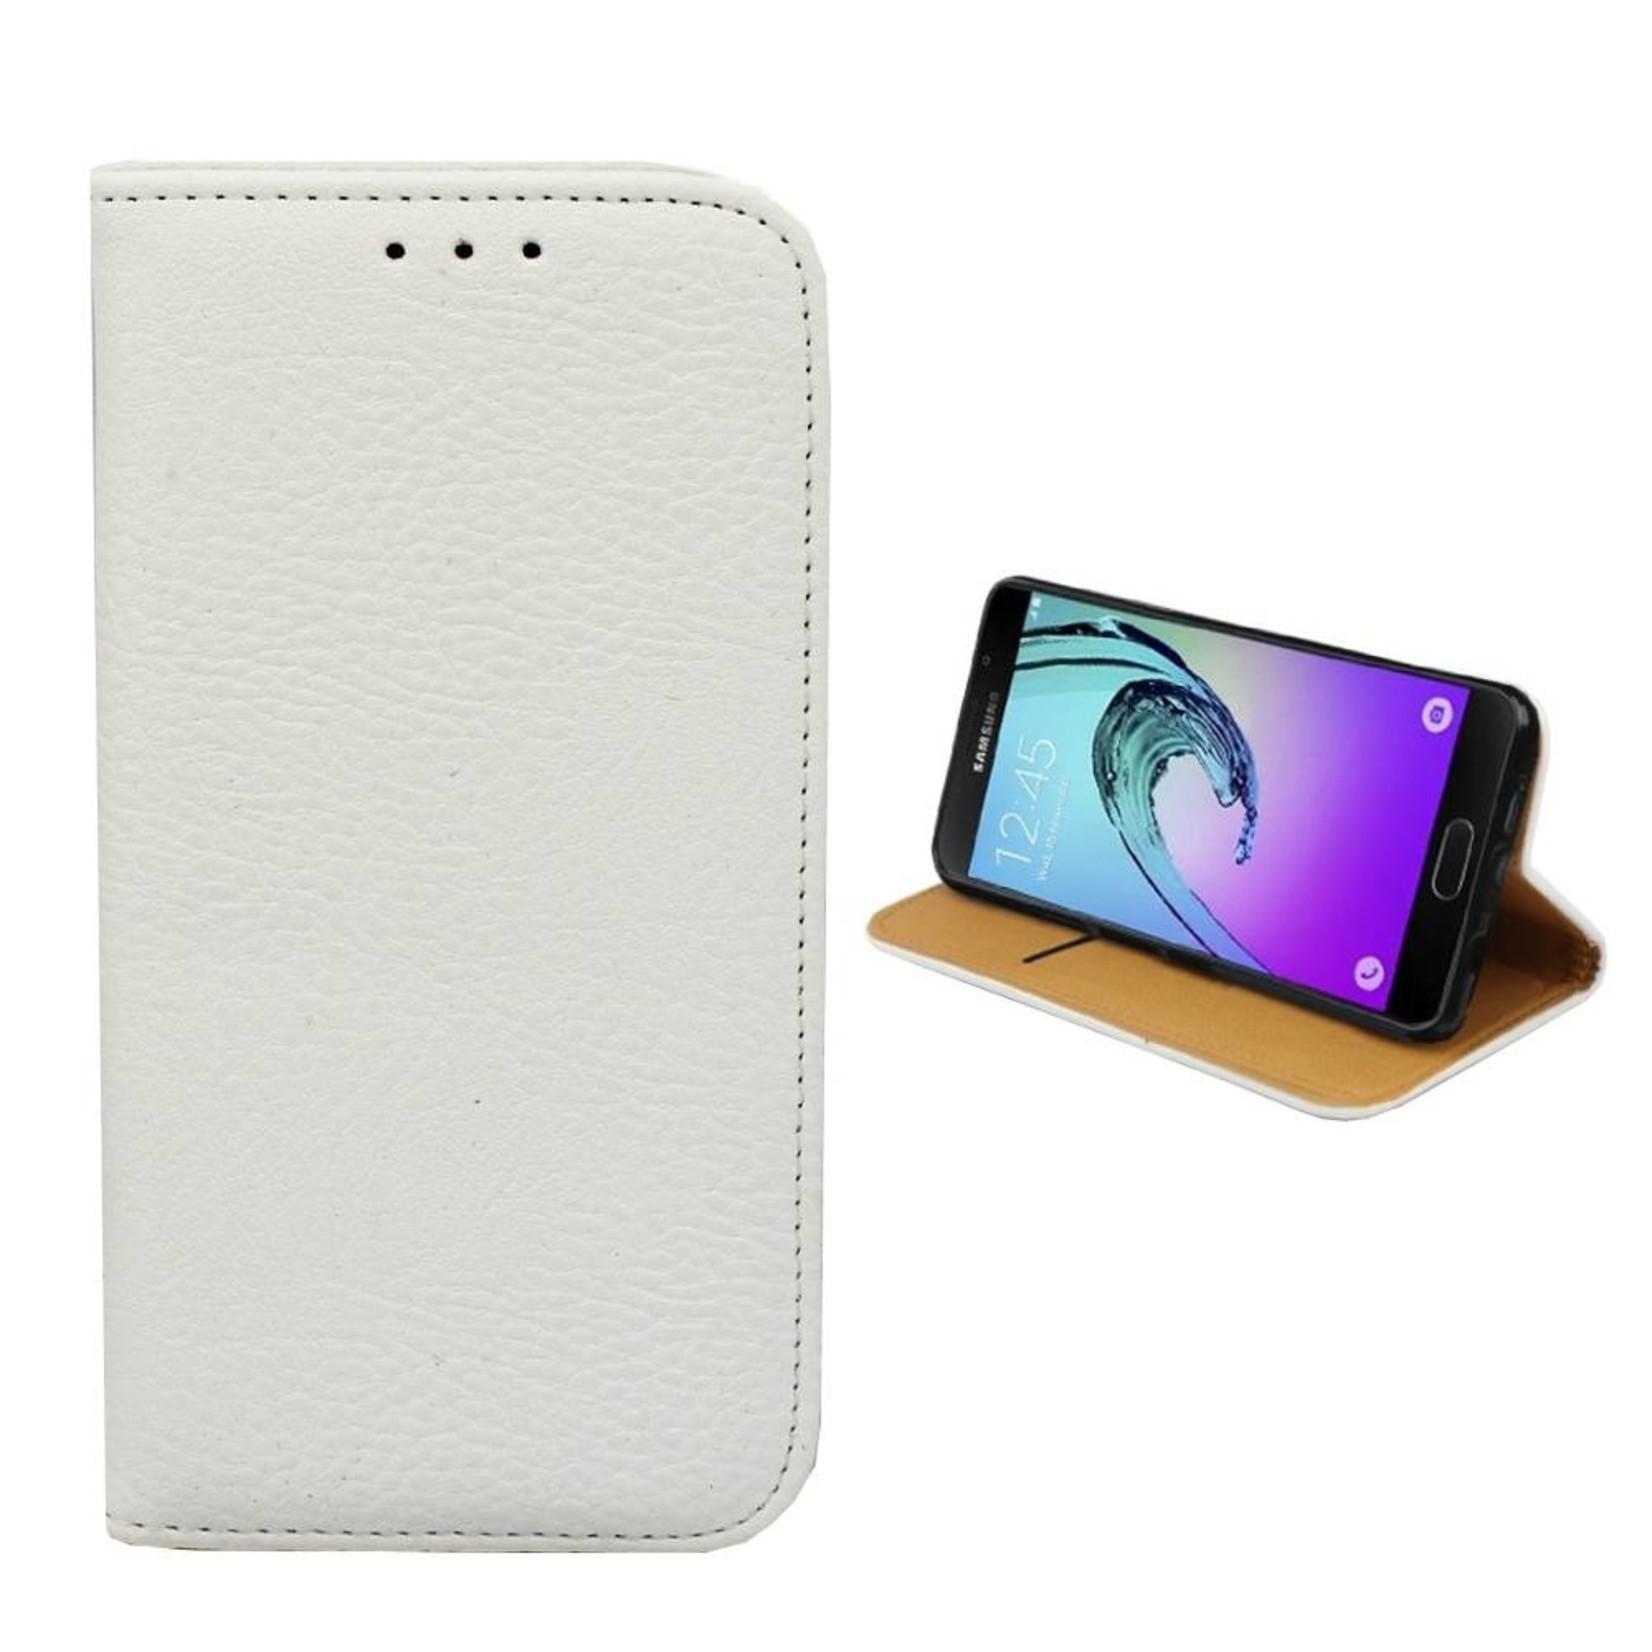 Colorfone Hoesje Book voor Samsung A3 2017 Wit